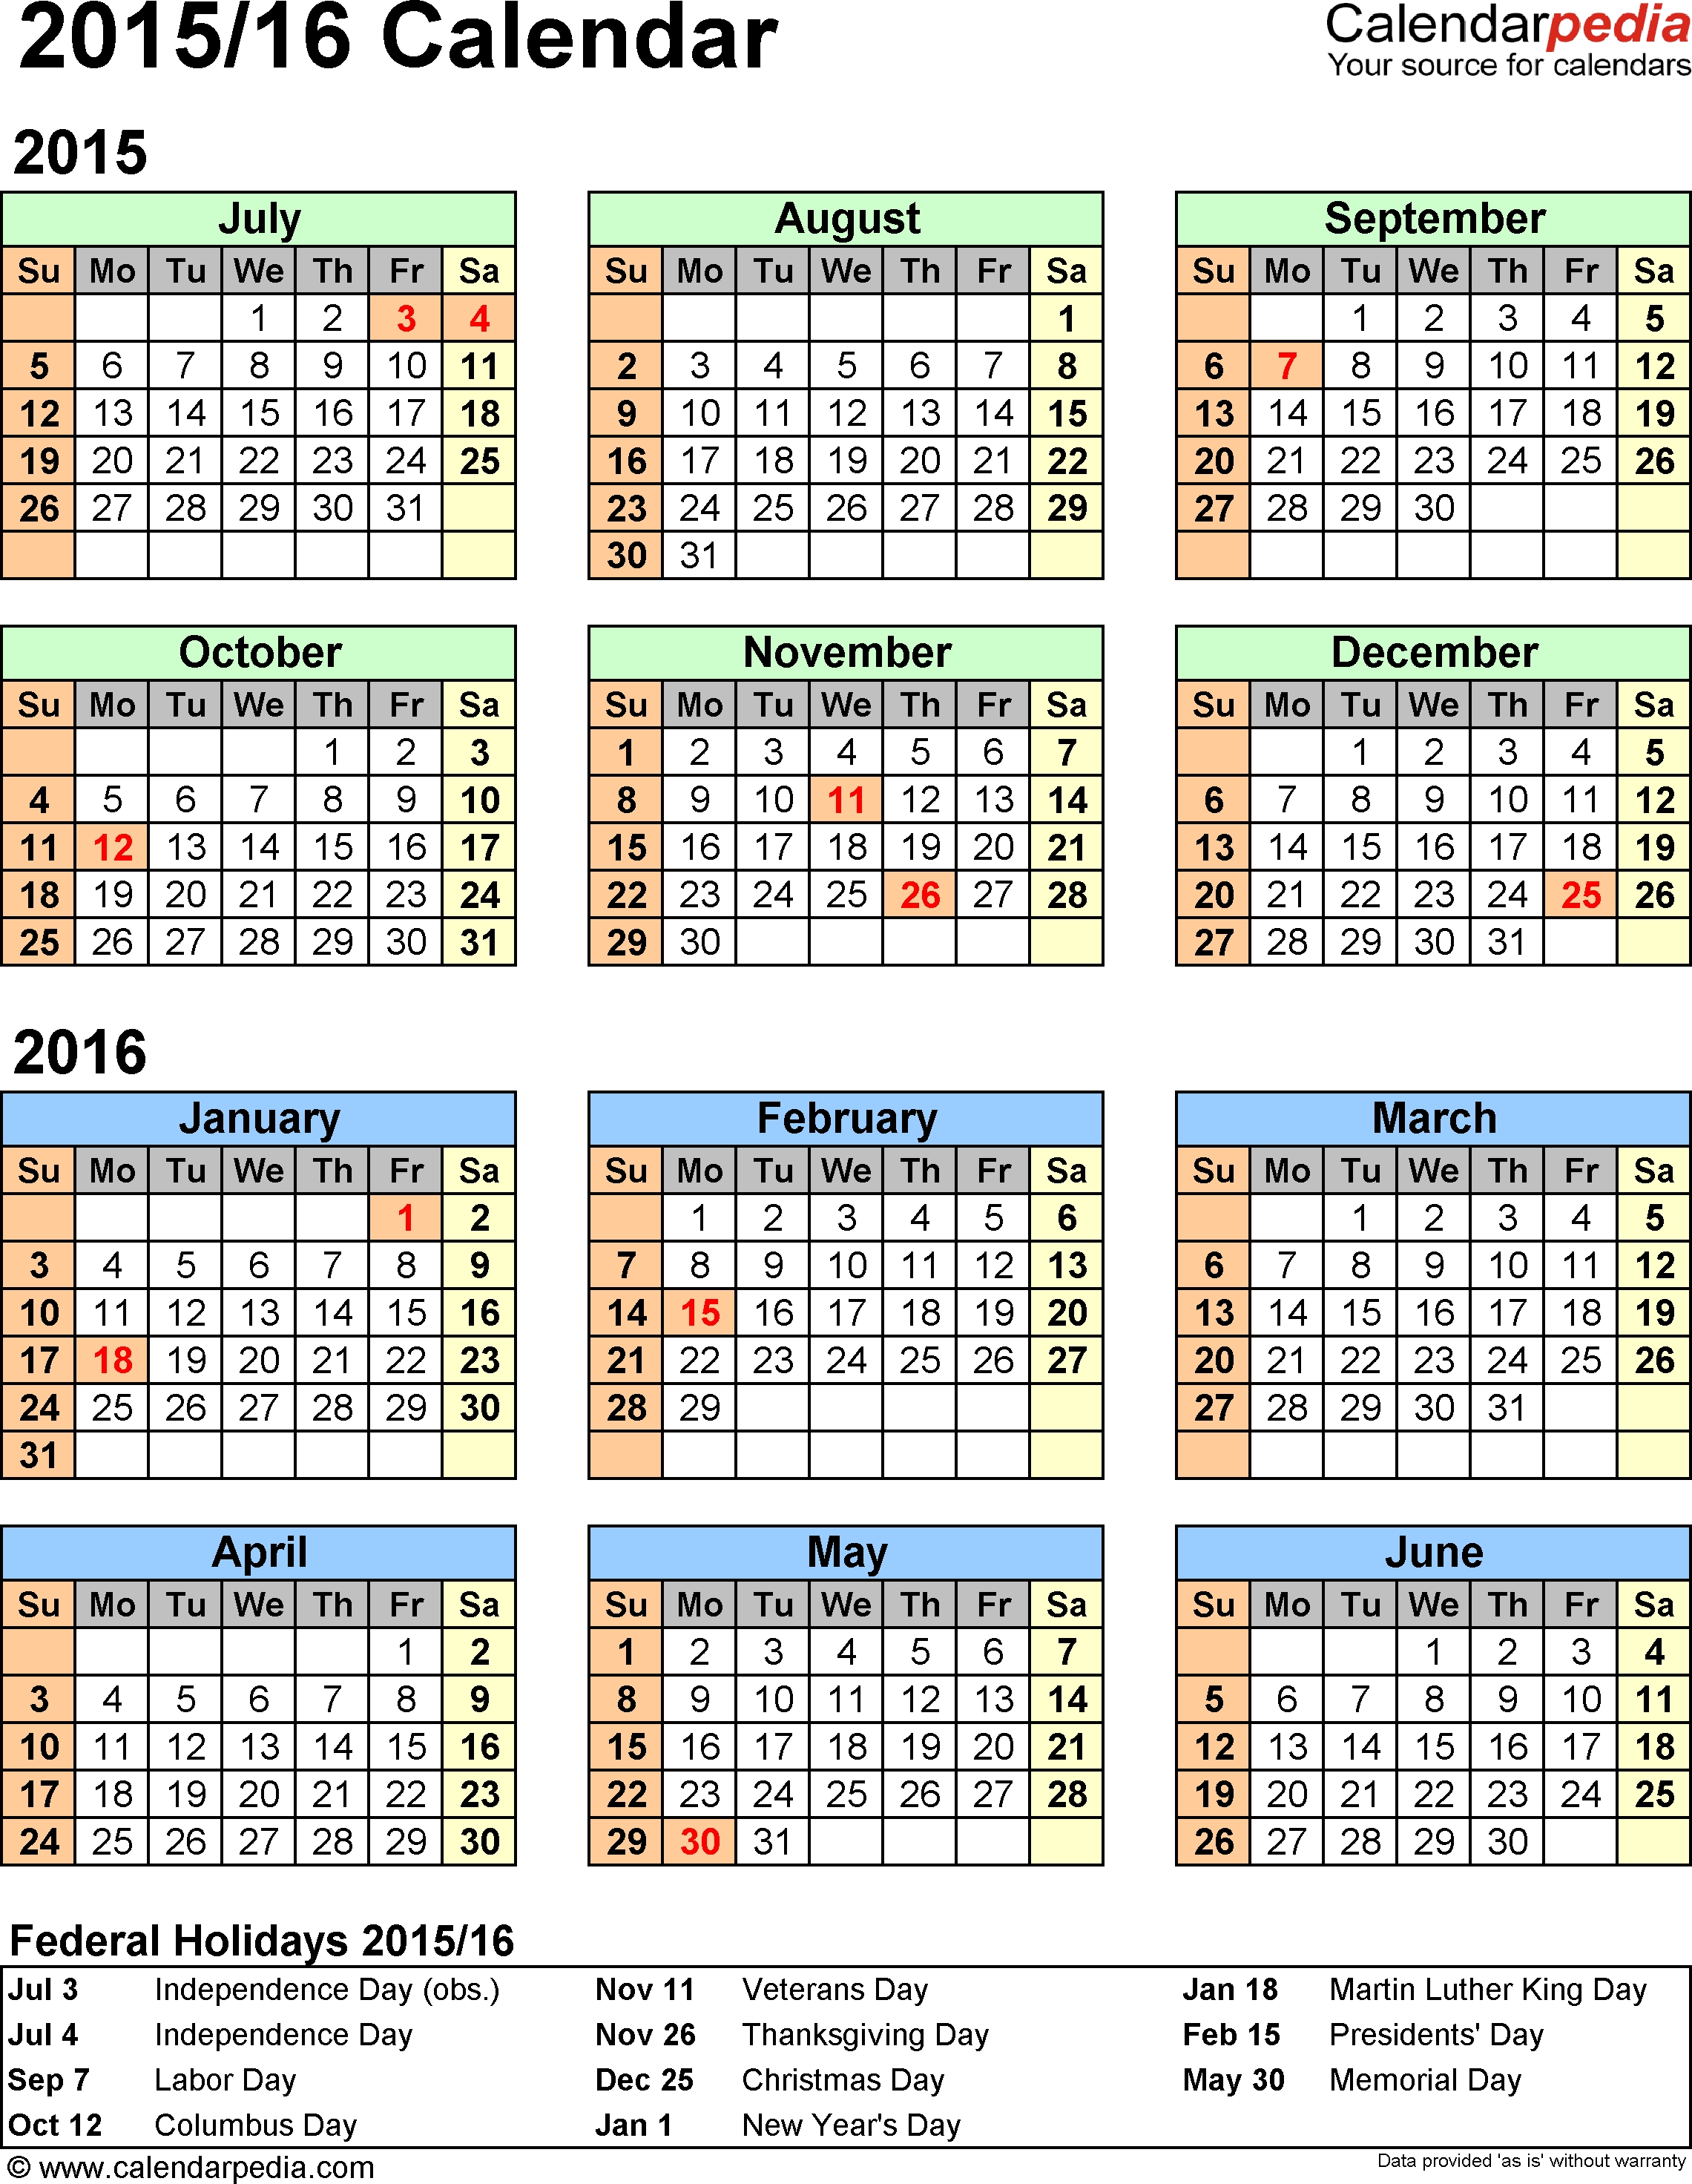 Split Year Calendar 2015/2016 - Printable Word Templates  Calendar 18/19 Financial Year Australia